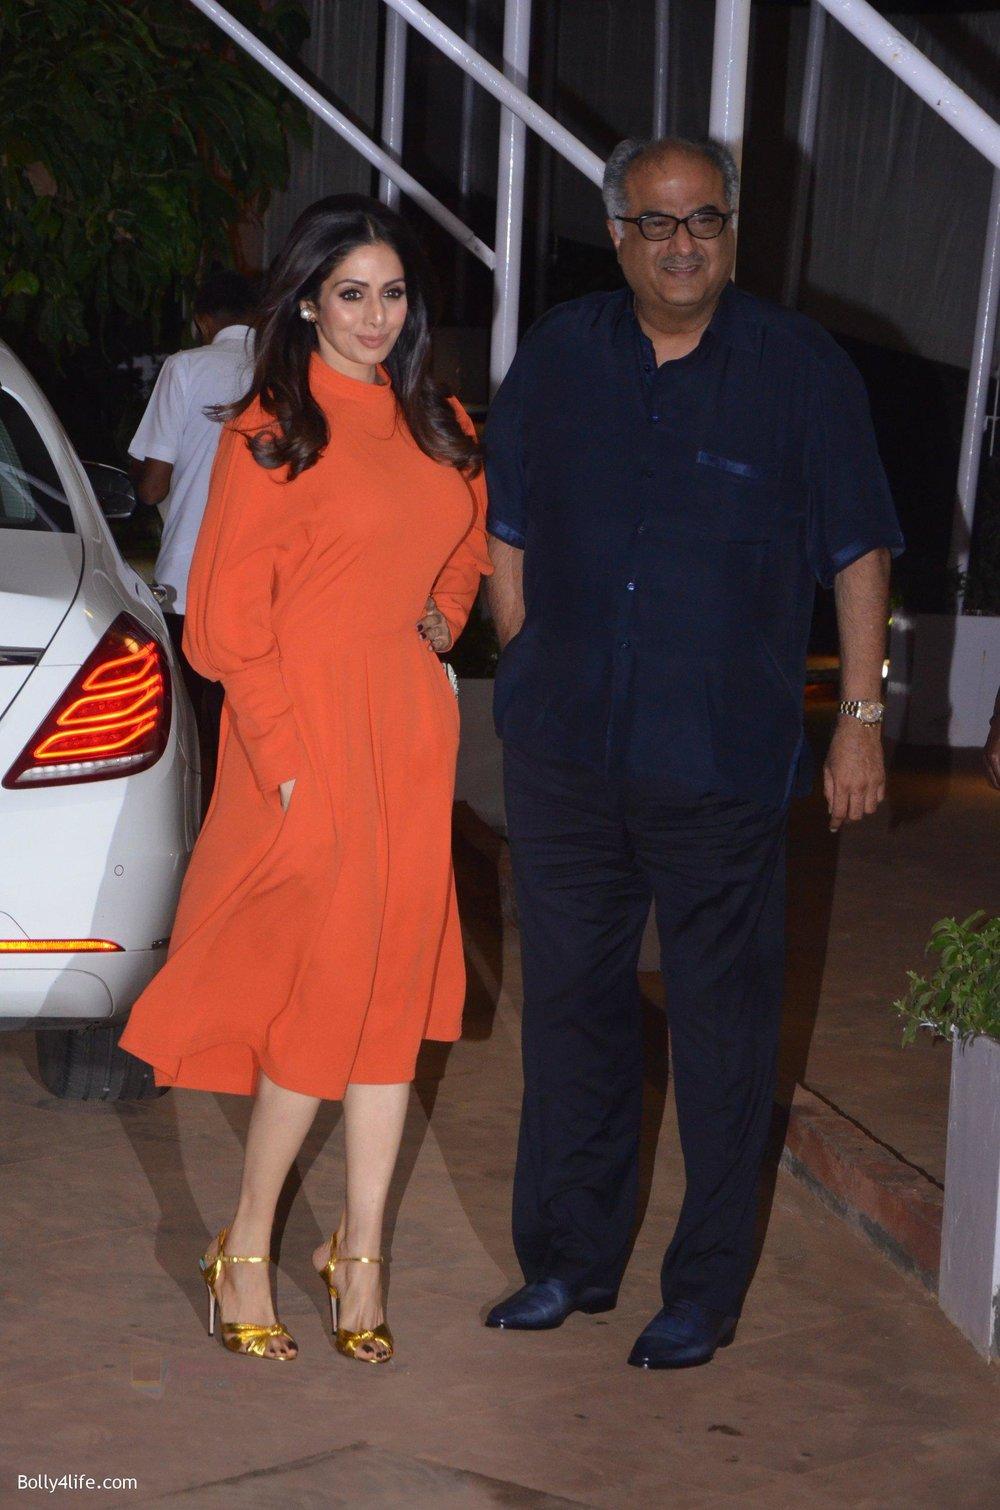 Boney-Kapoor-Sridevi-at-Reema-jain-bday-party-in-Amadeus-NCPA-on-28th-Sept-2016-1033_57ecbc976cfcf.jpg